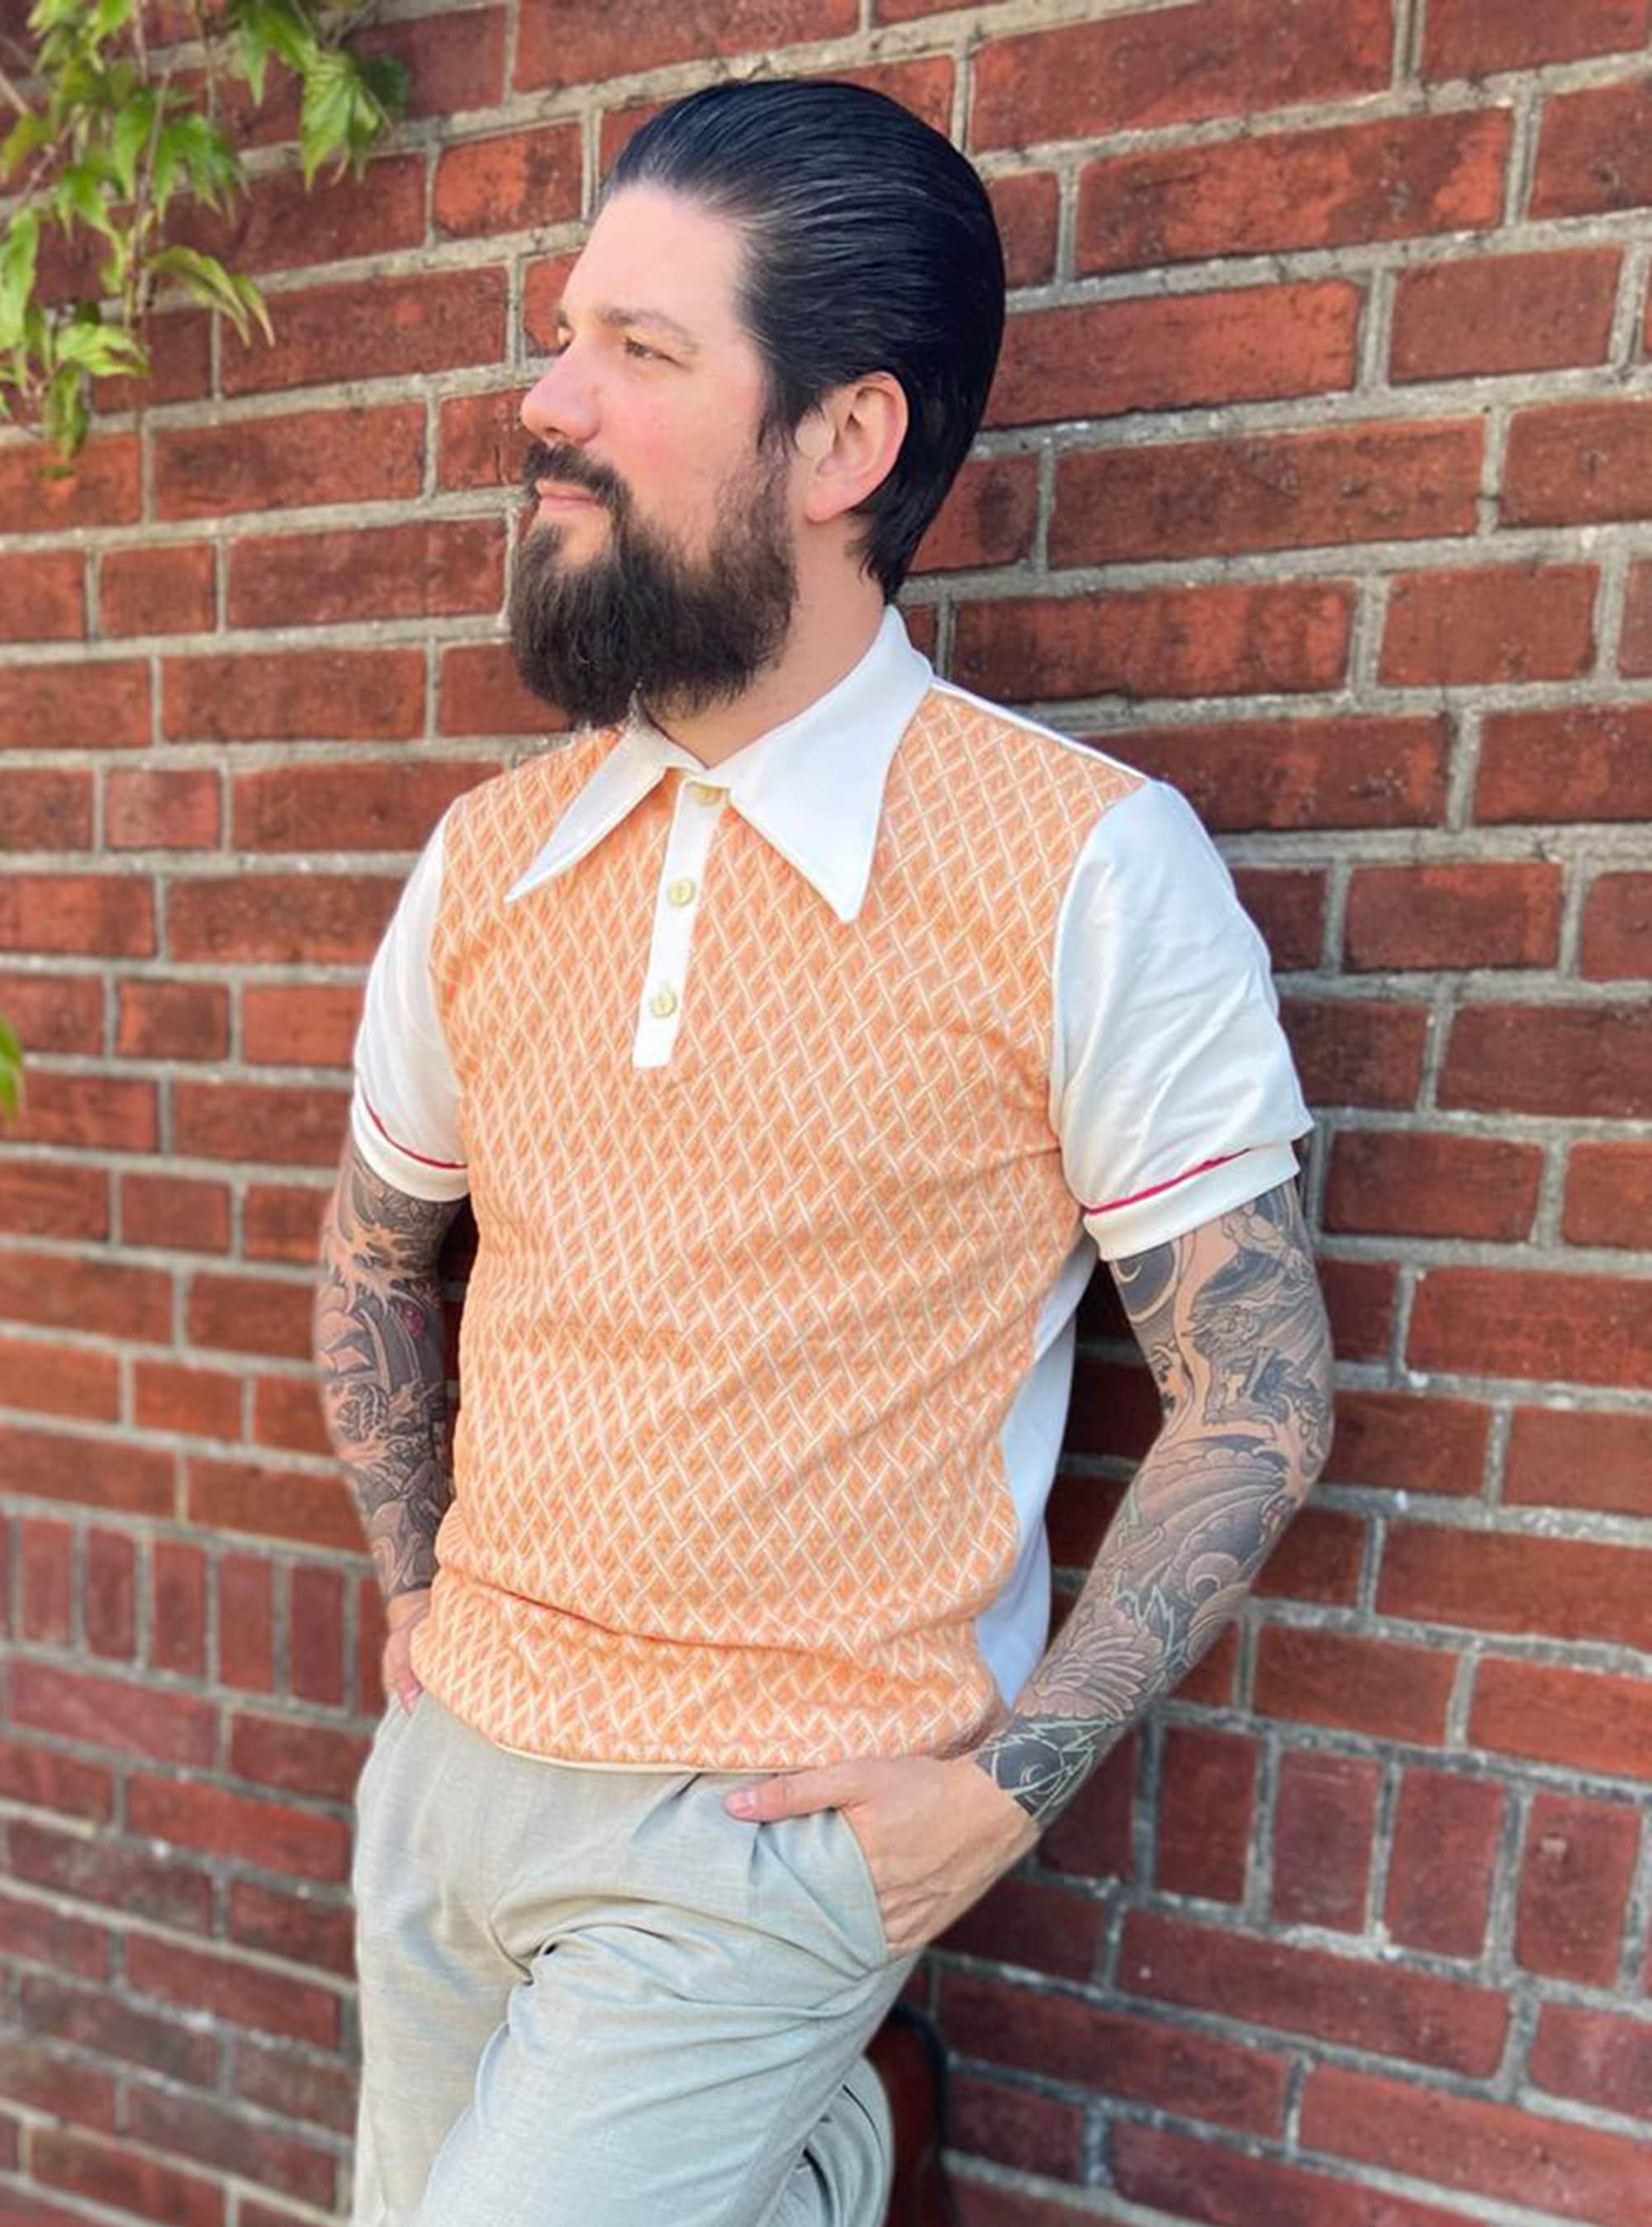 1940s Men's Shirts, Sweaters, Vests Vintage Style Polo Orange, Salmon Pink Mens Shirt, Retro 30S, 40S Mens Polo, Checkered Bio Cotton Lindy Hop $114.49 AT vintagedancer.com